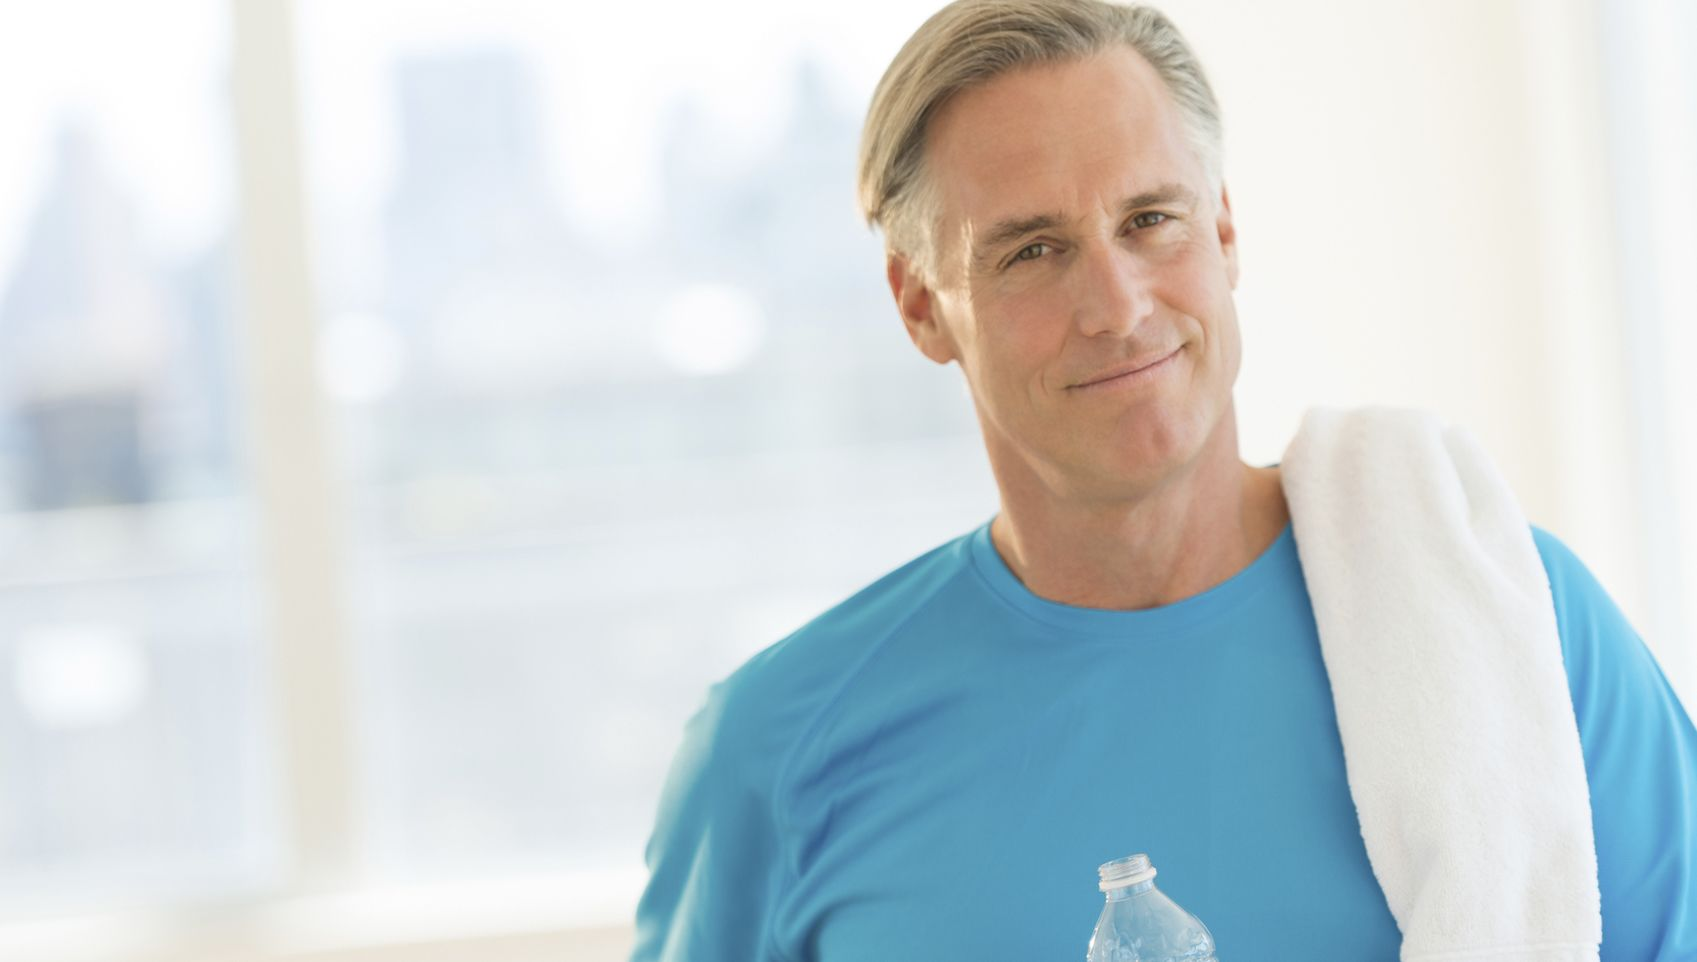 DIY Health Checks for Men